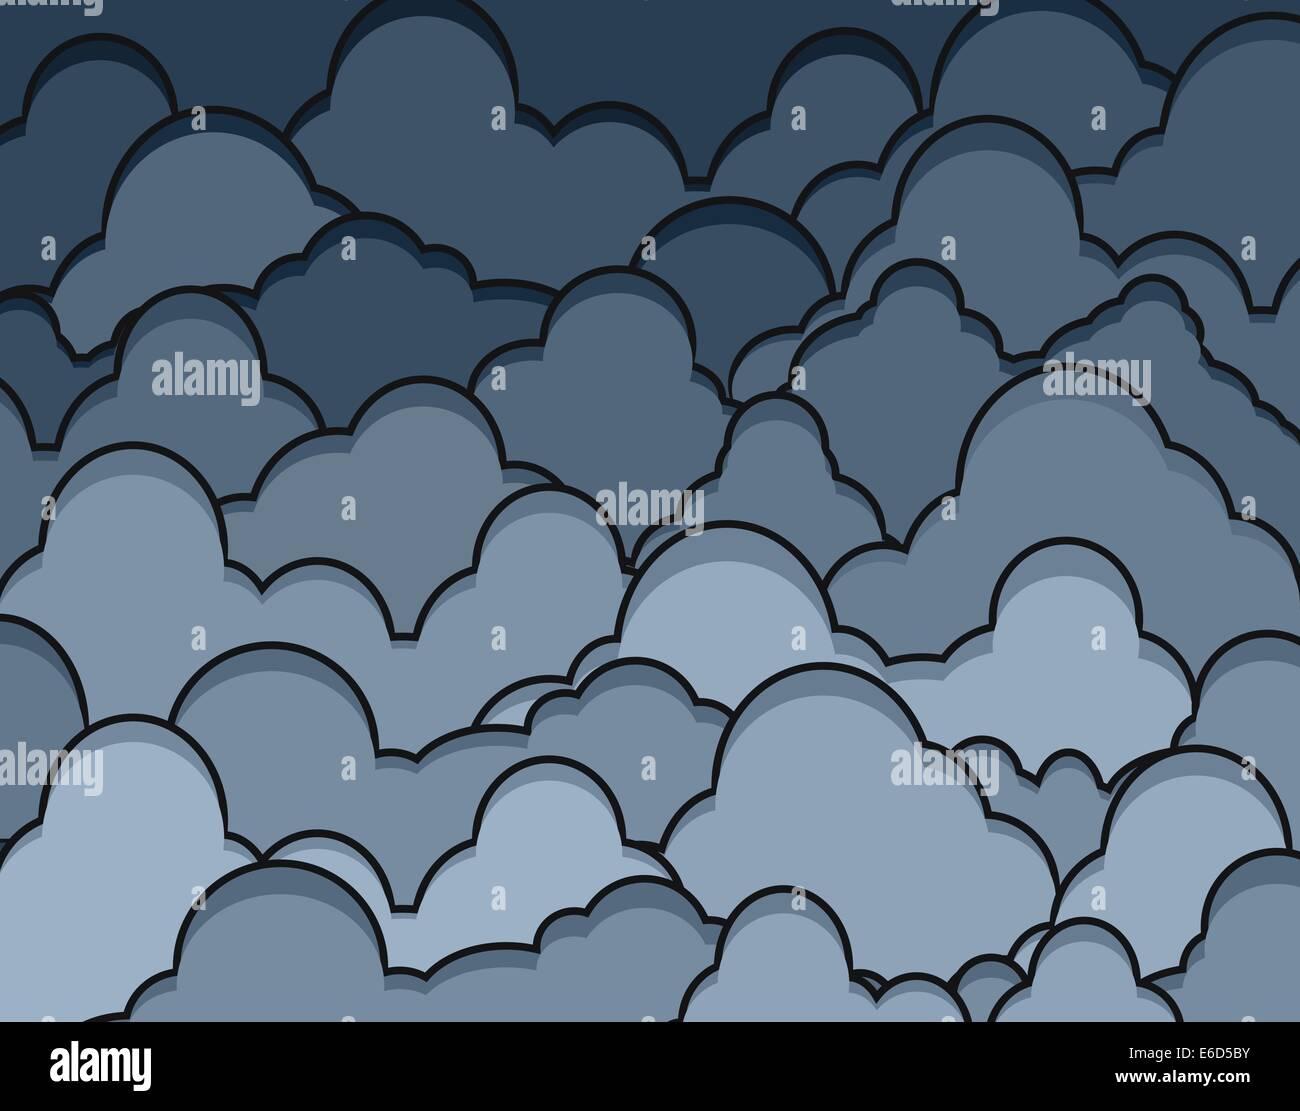 Editable vector illustration of dark heavy clouds - Stock Image